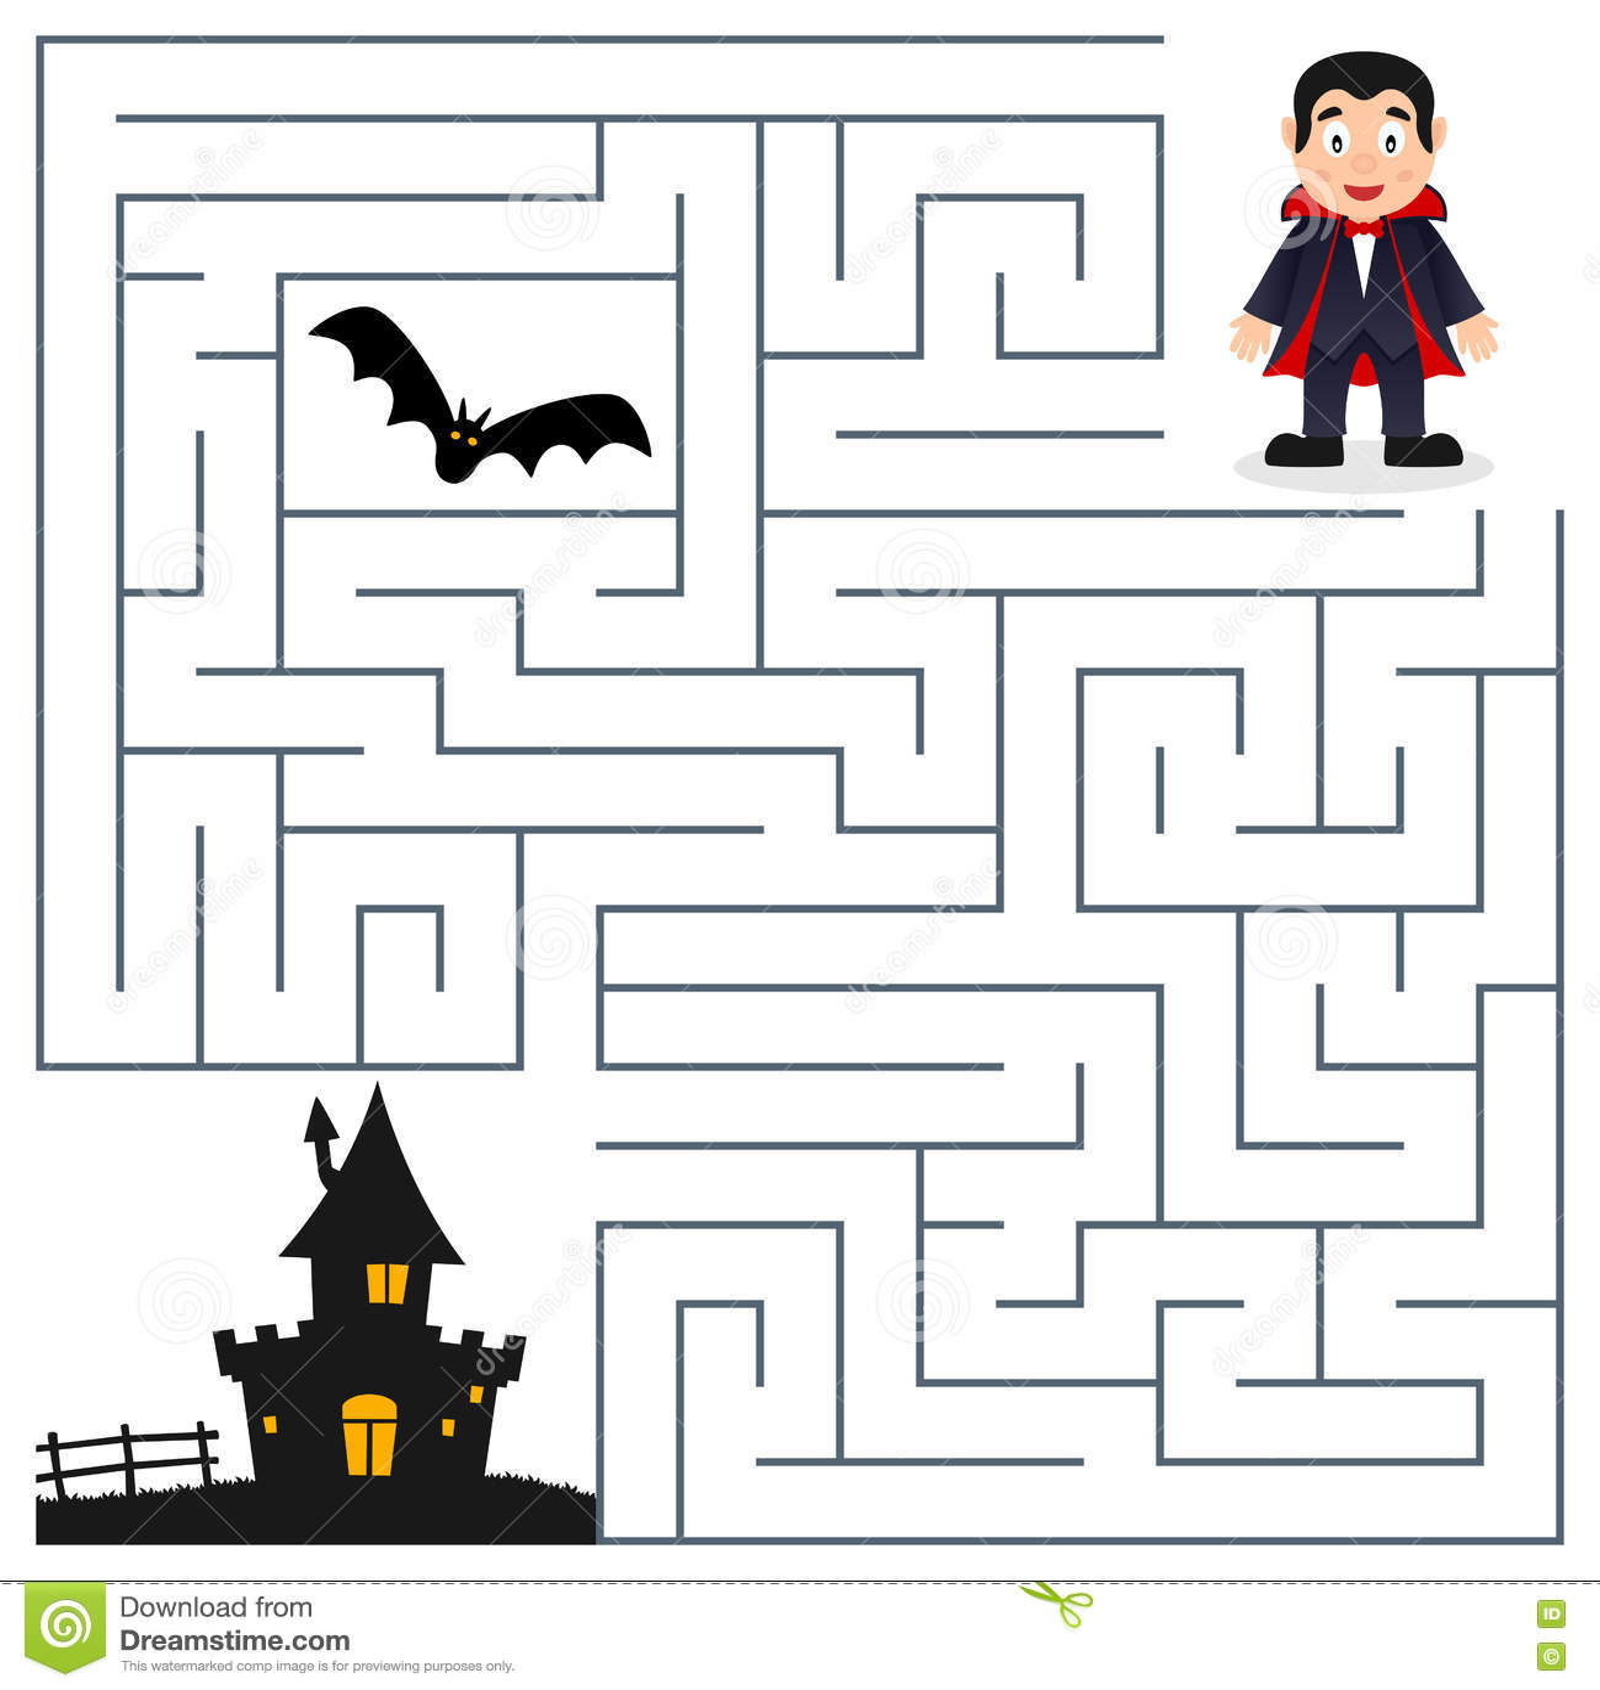 Haunted Houses Mazes For Preschoolers Worksheet